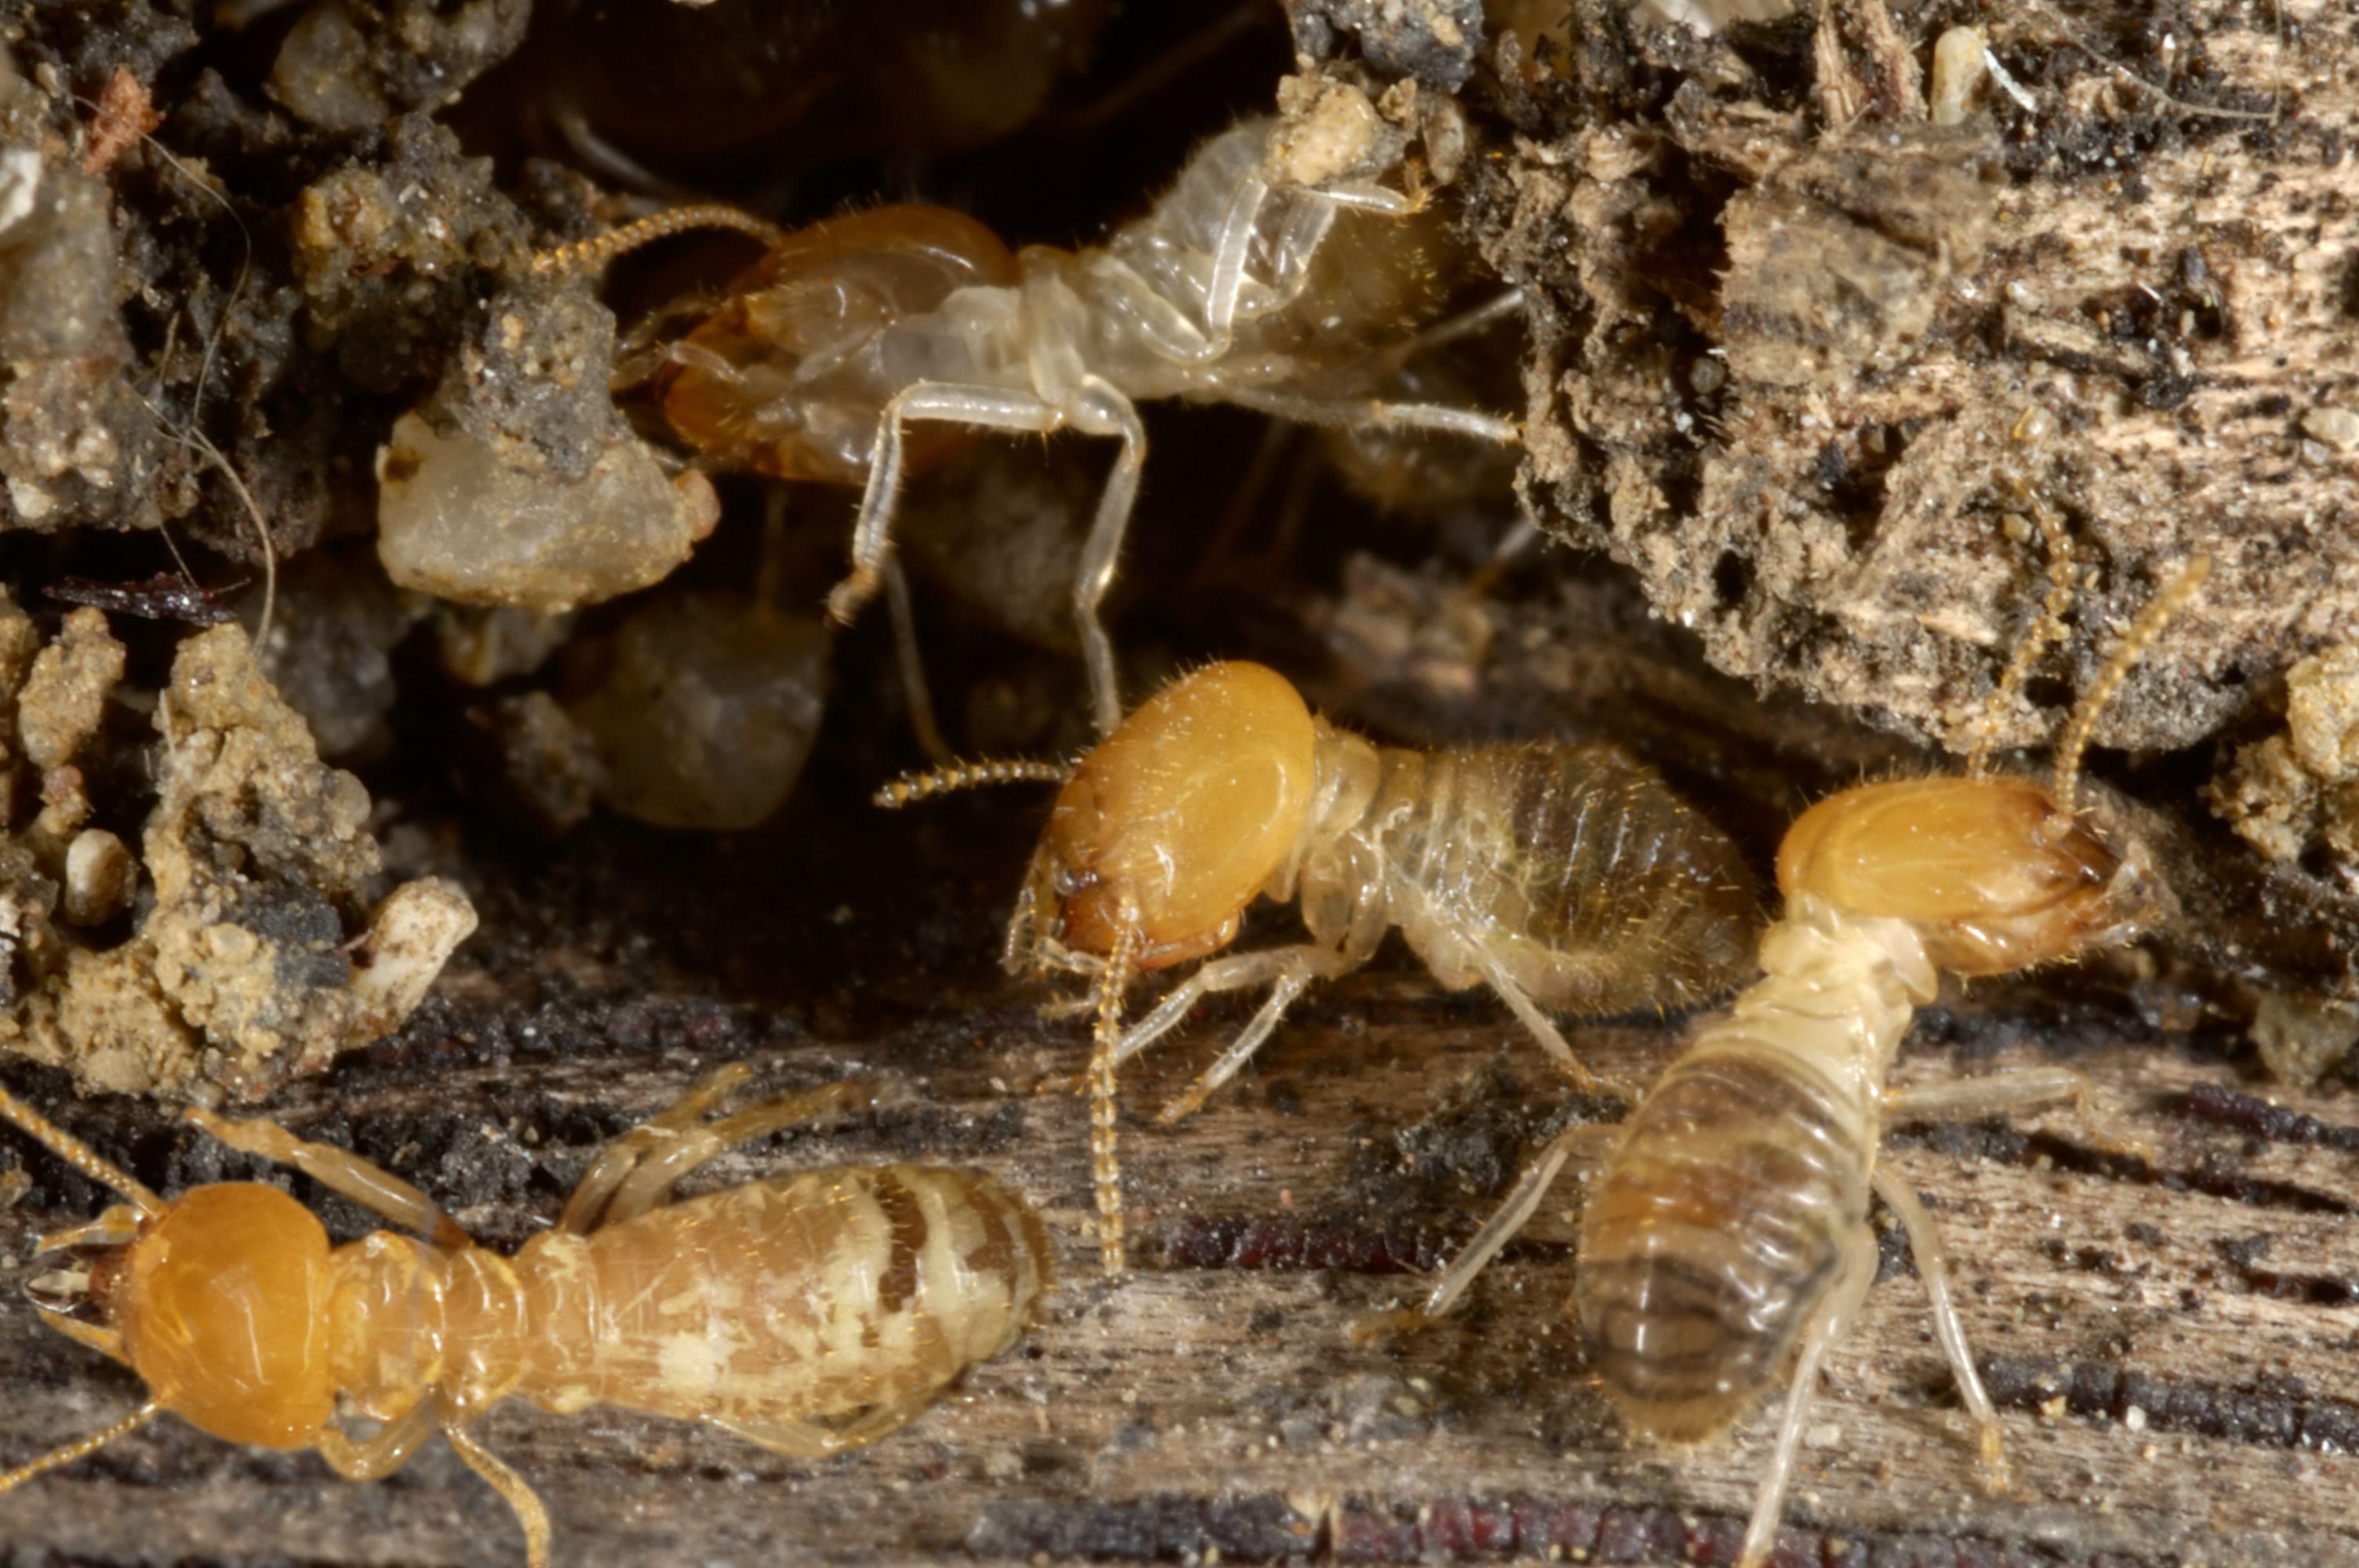 Several termites digging holes into wood.